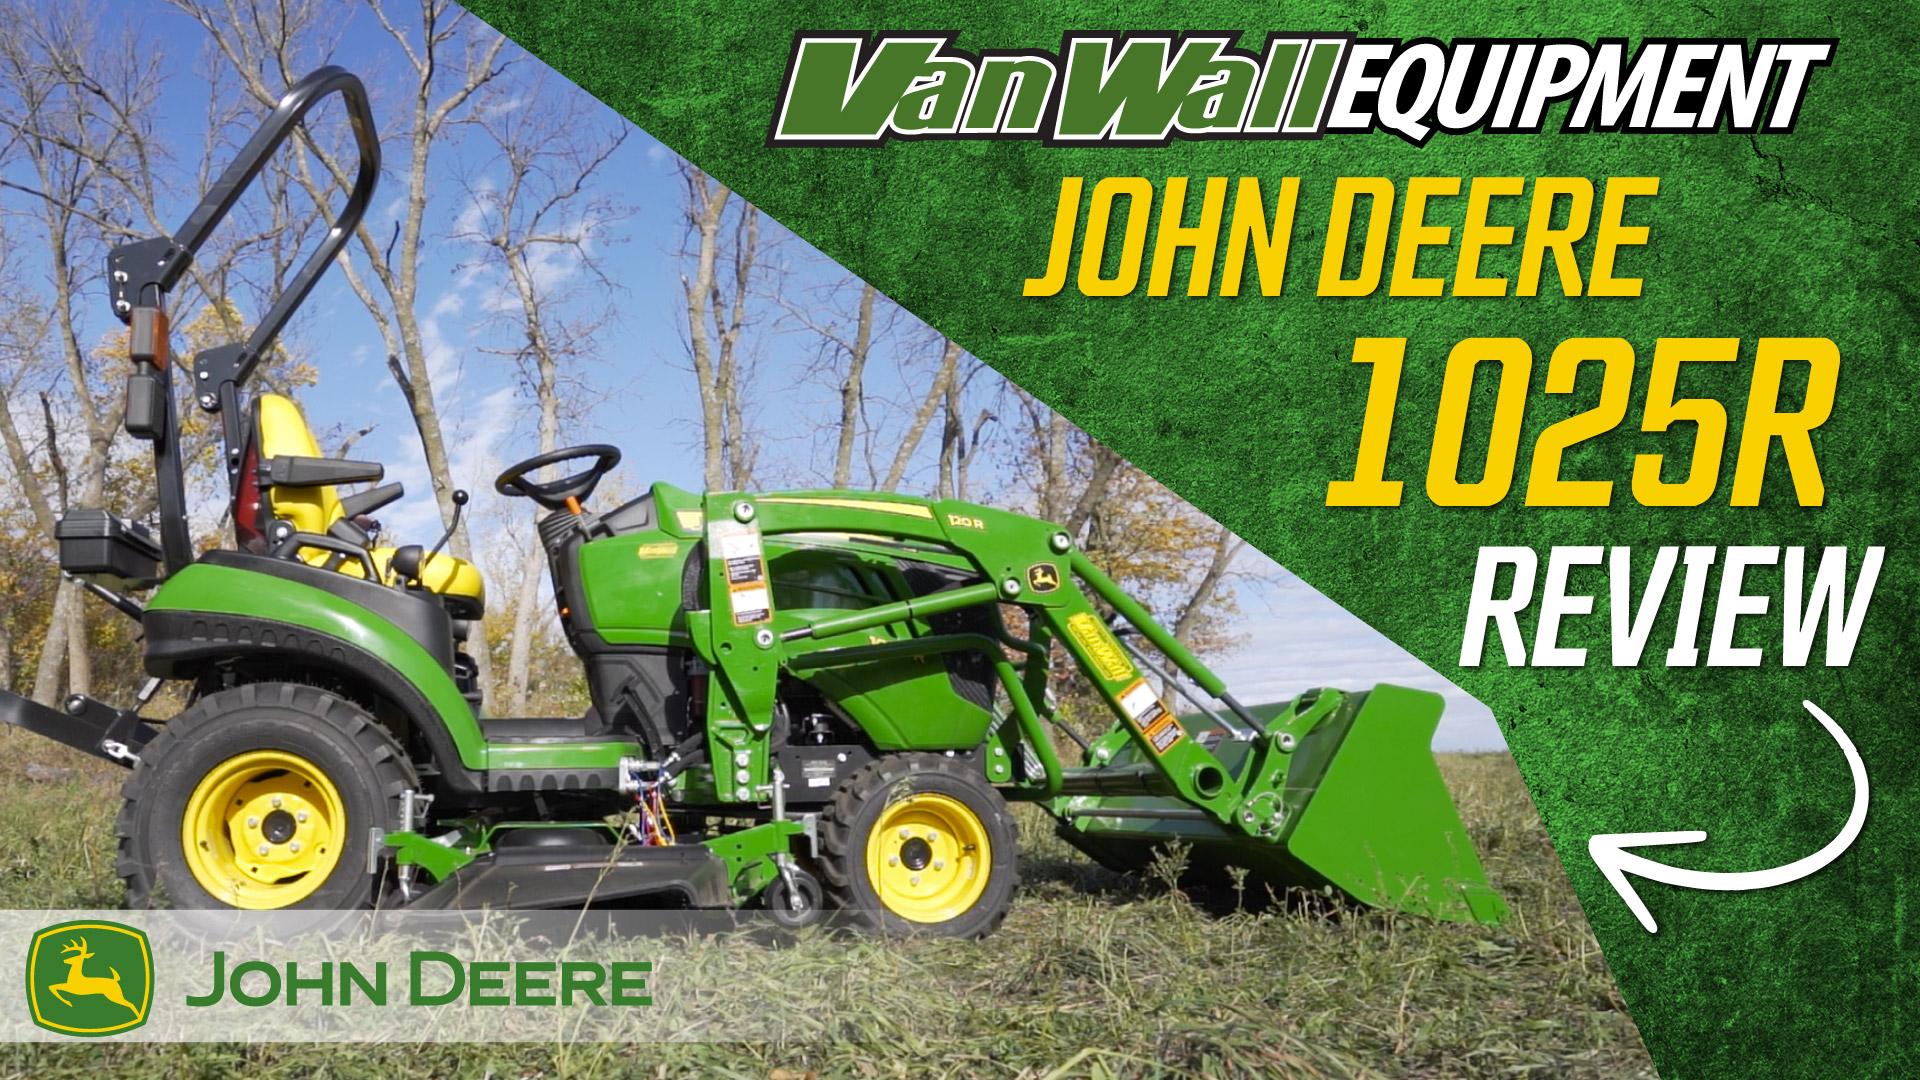 John Deere 1025R Tractor Review